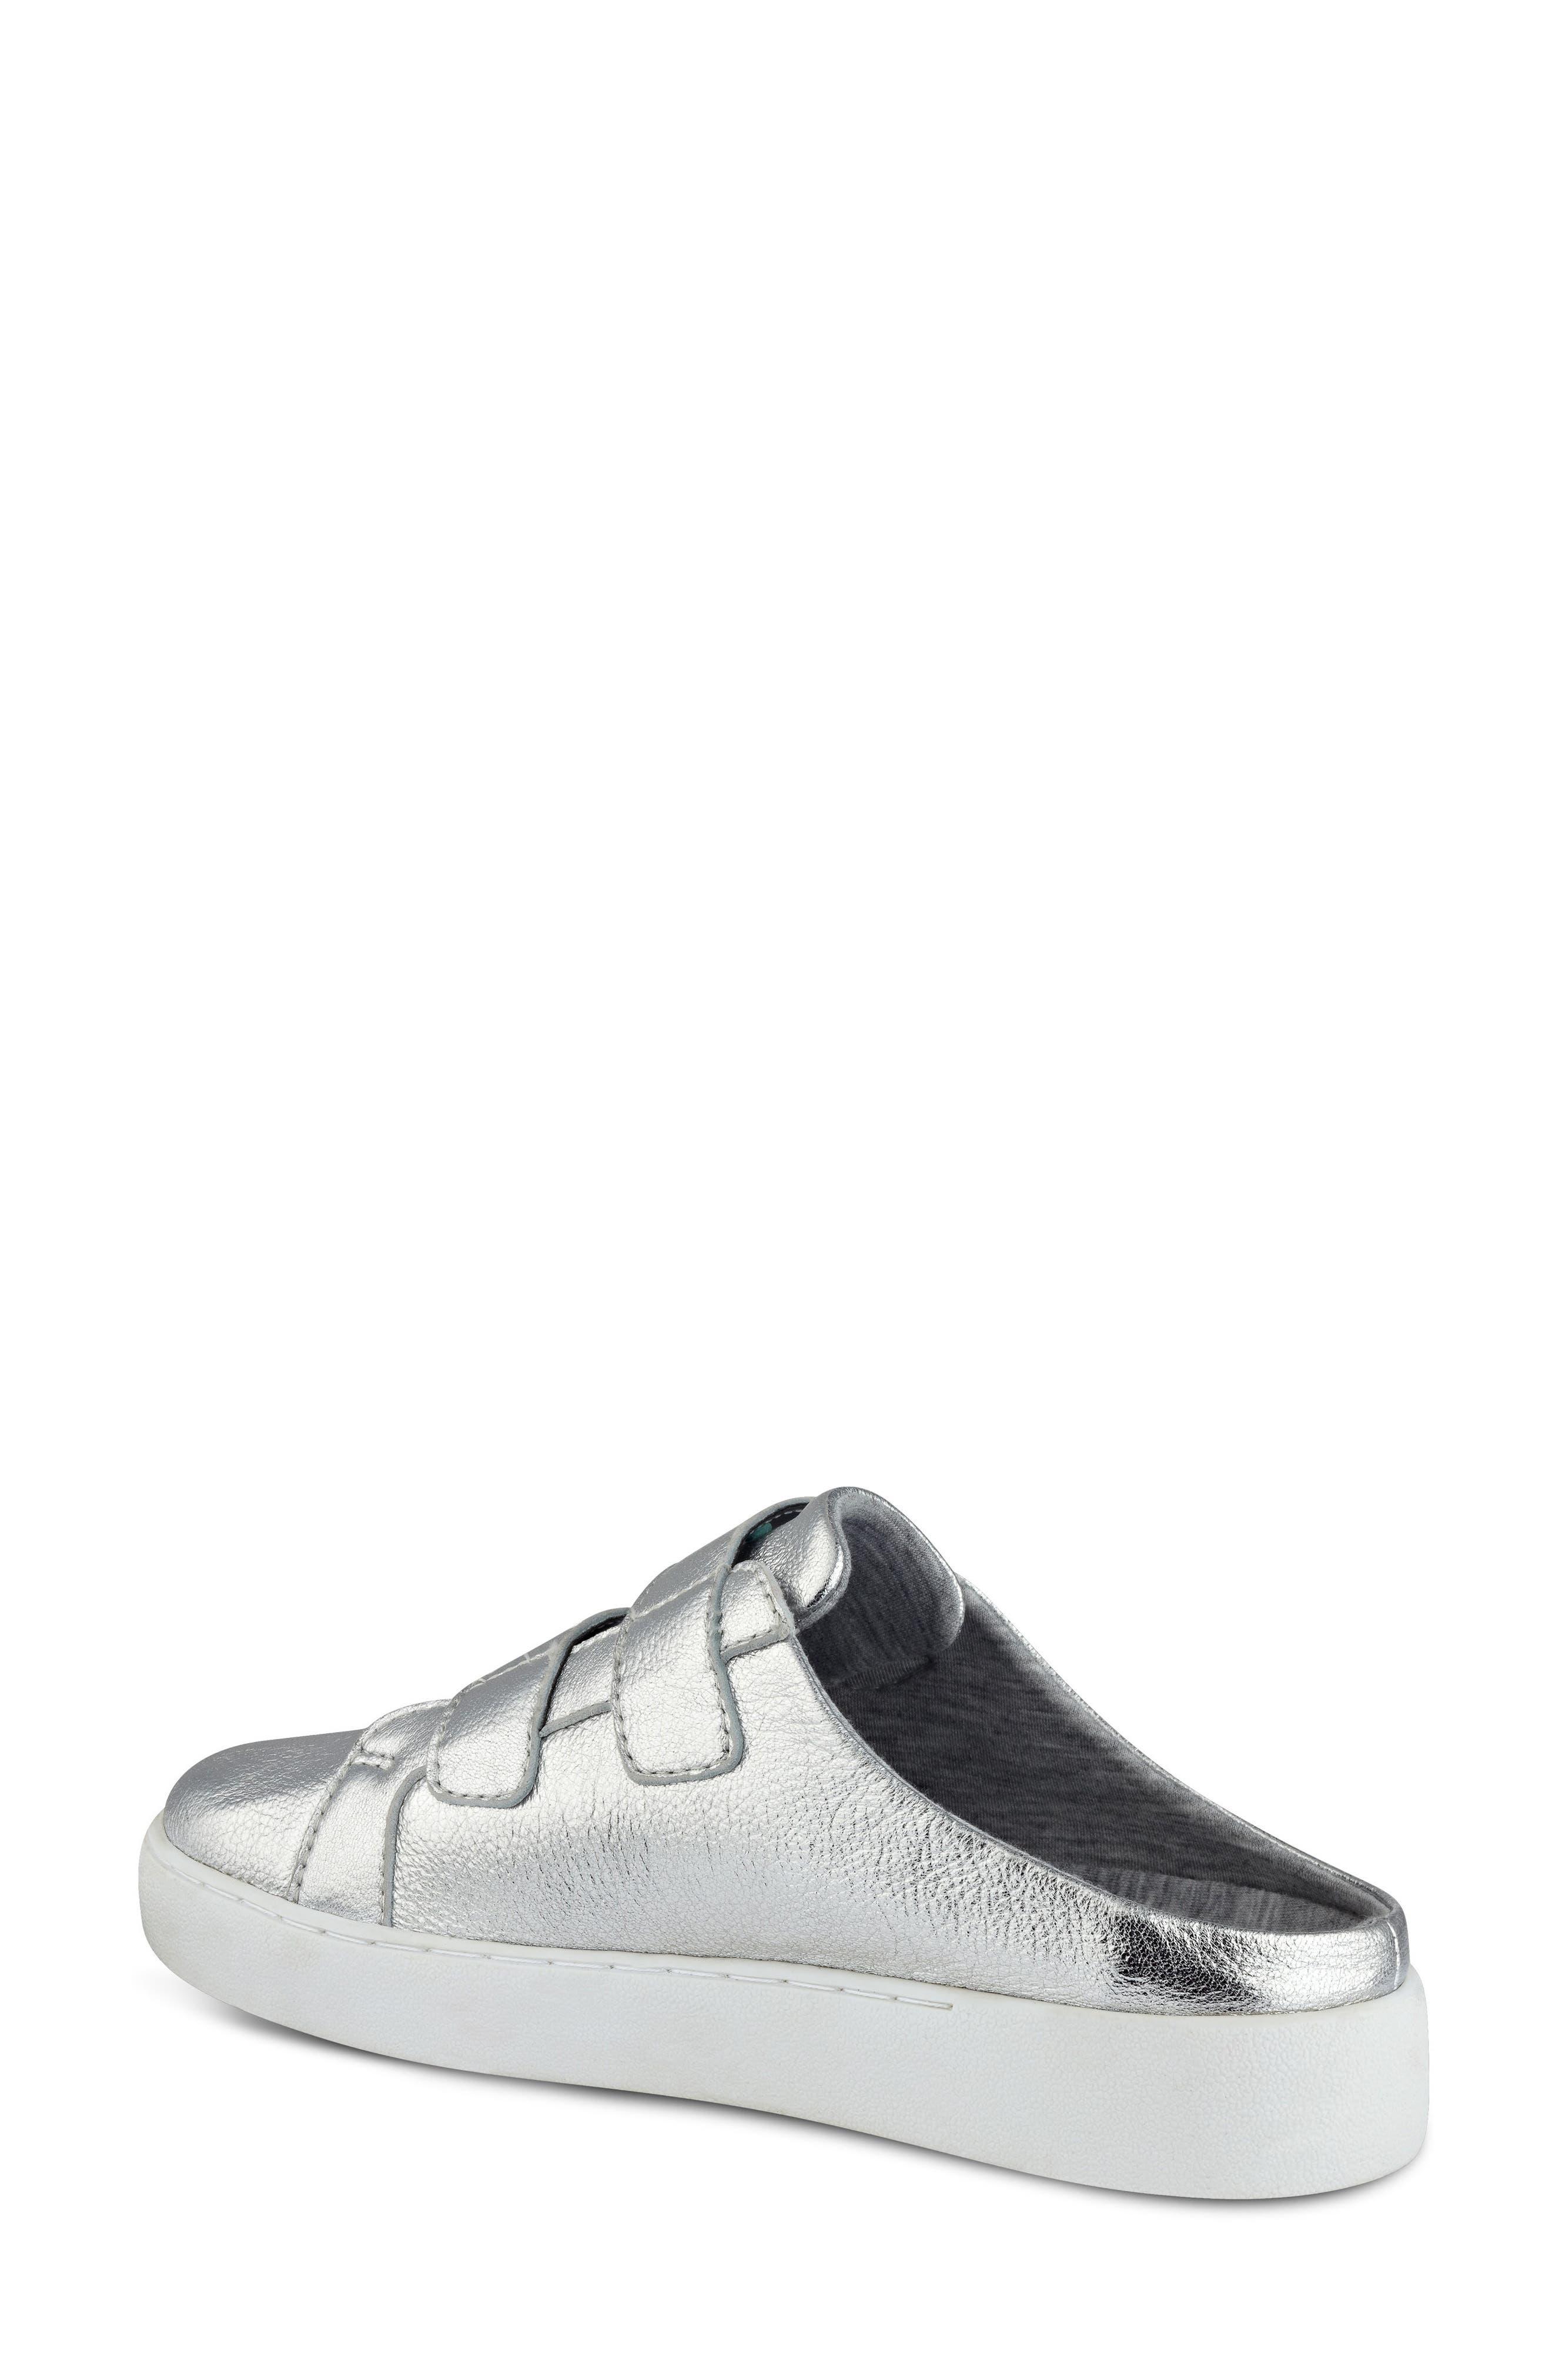 Poeton Sneaker Mule,                             Alternate thumbnail 3, color,